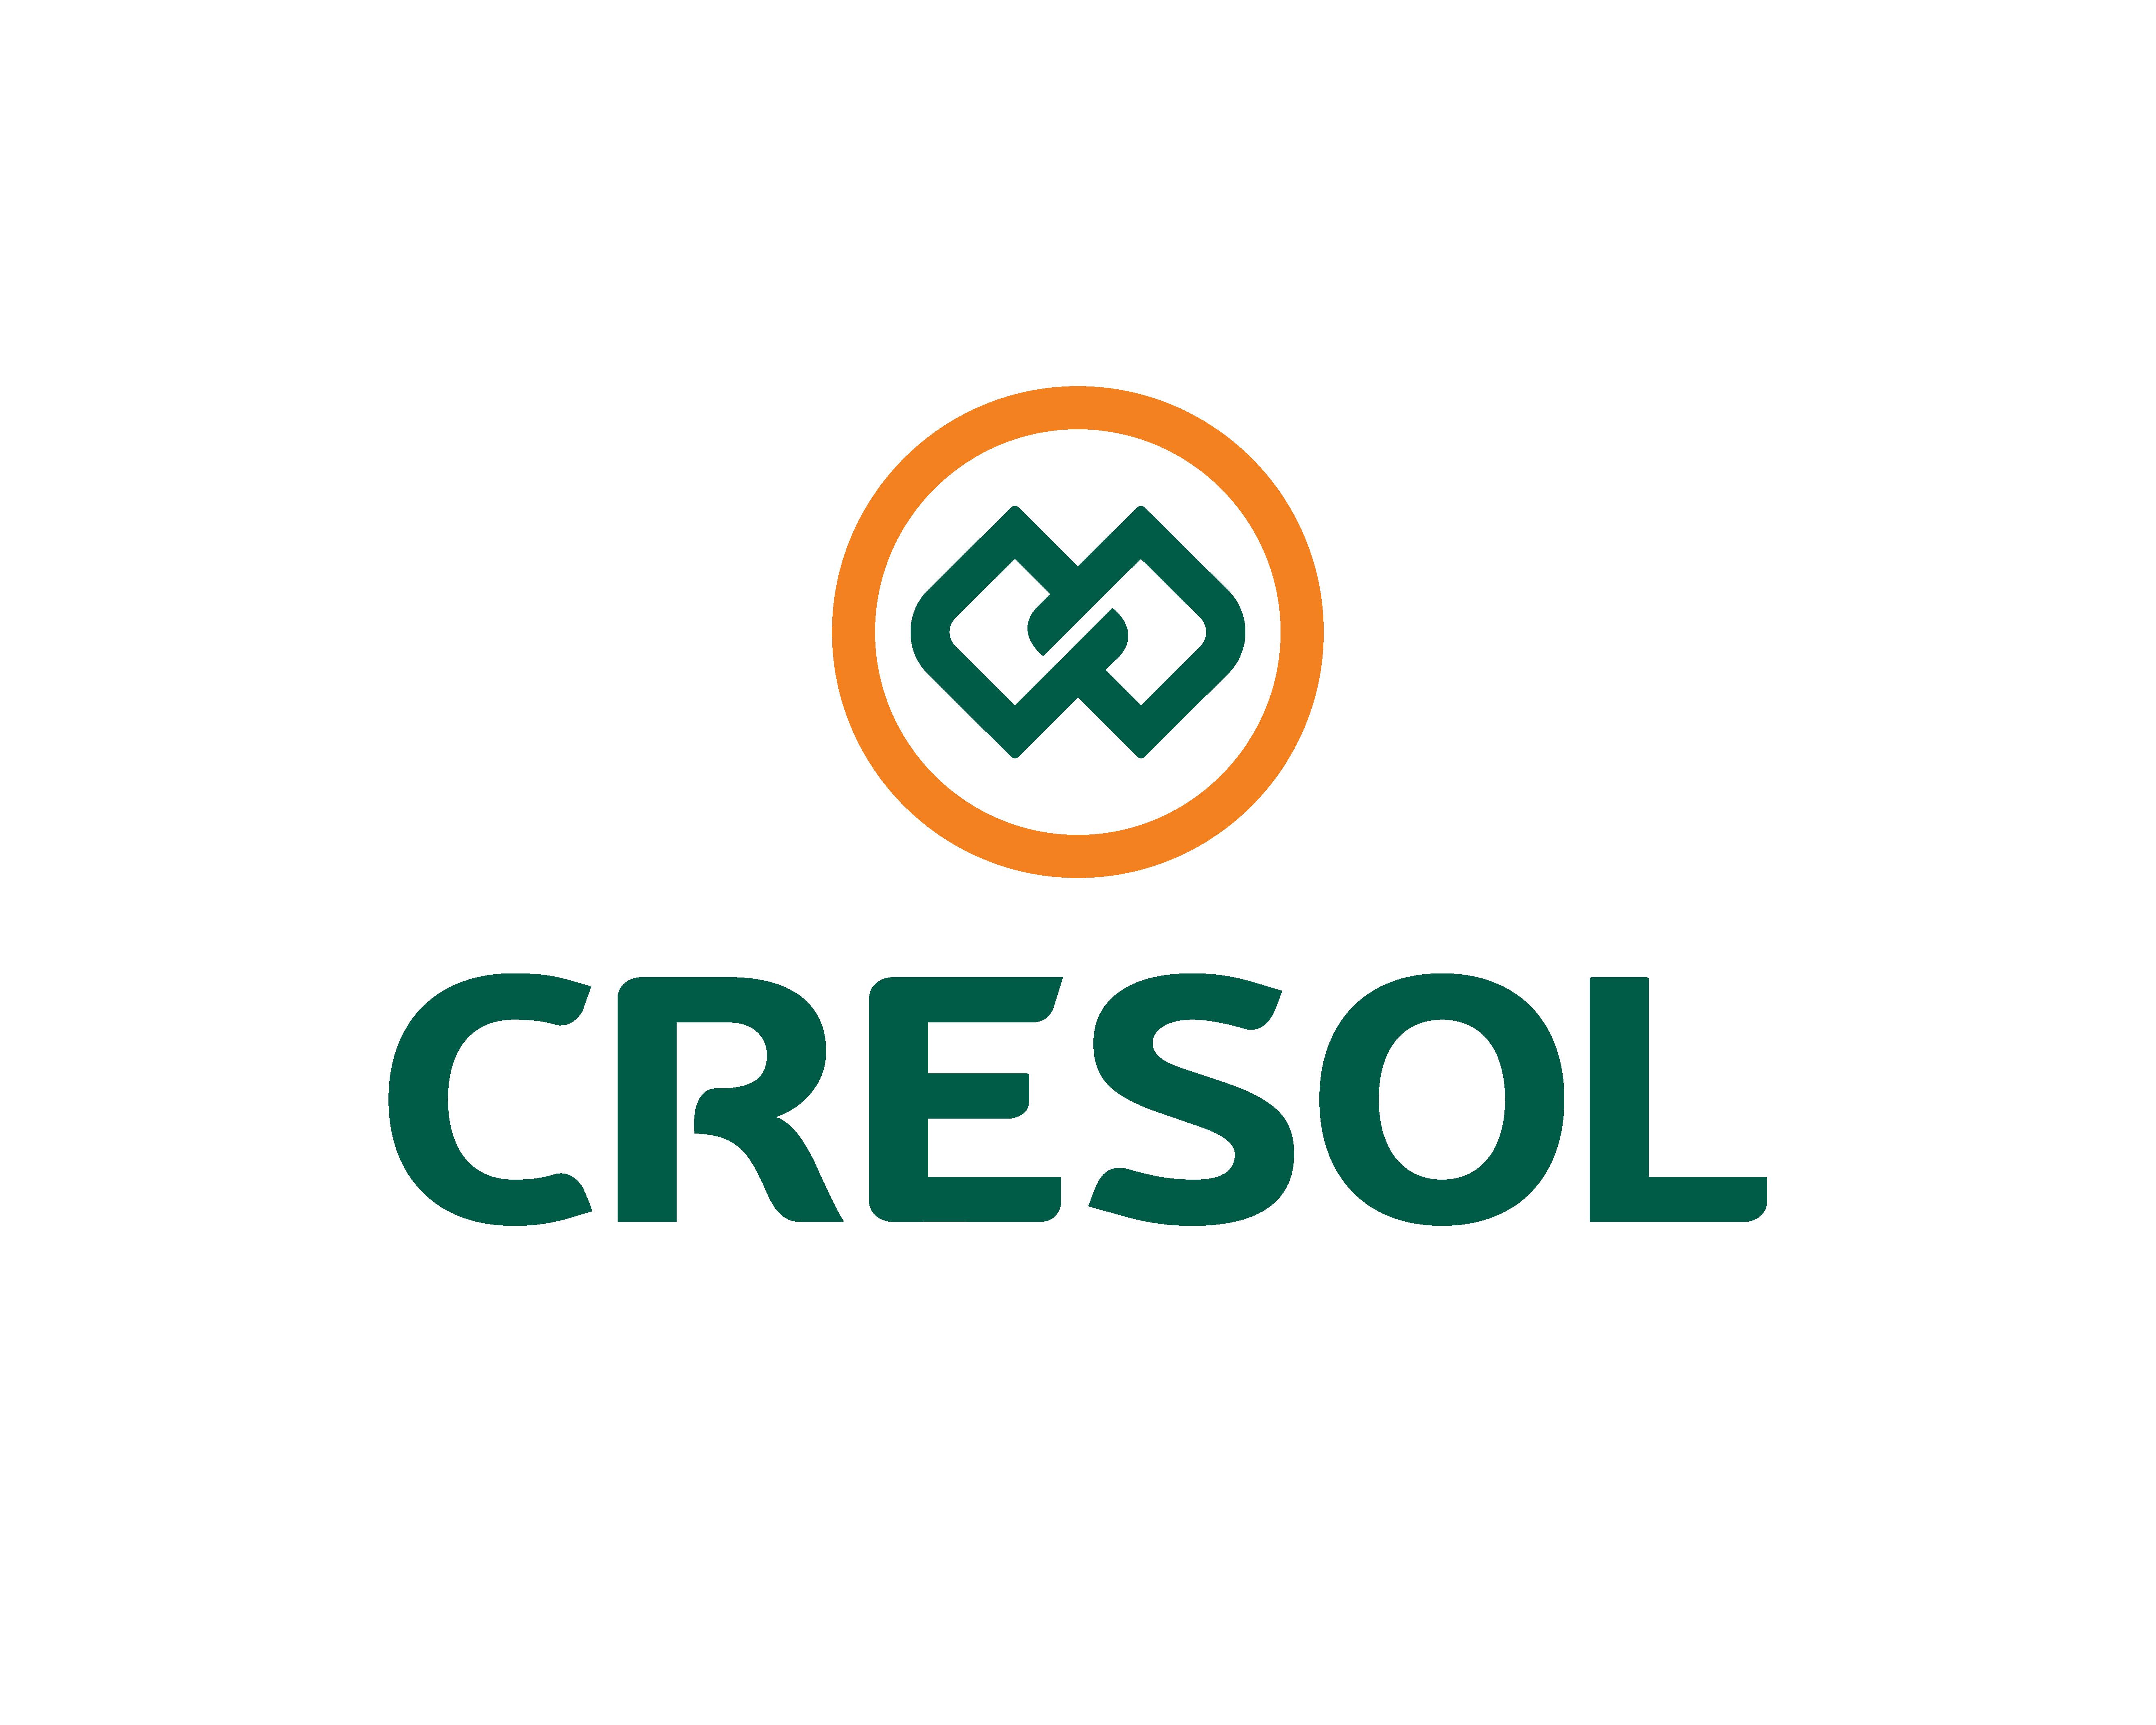 Cresol